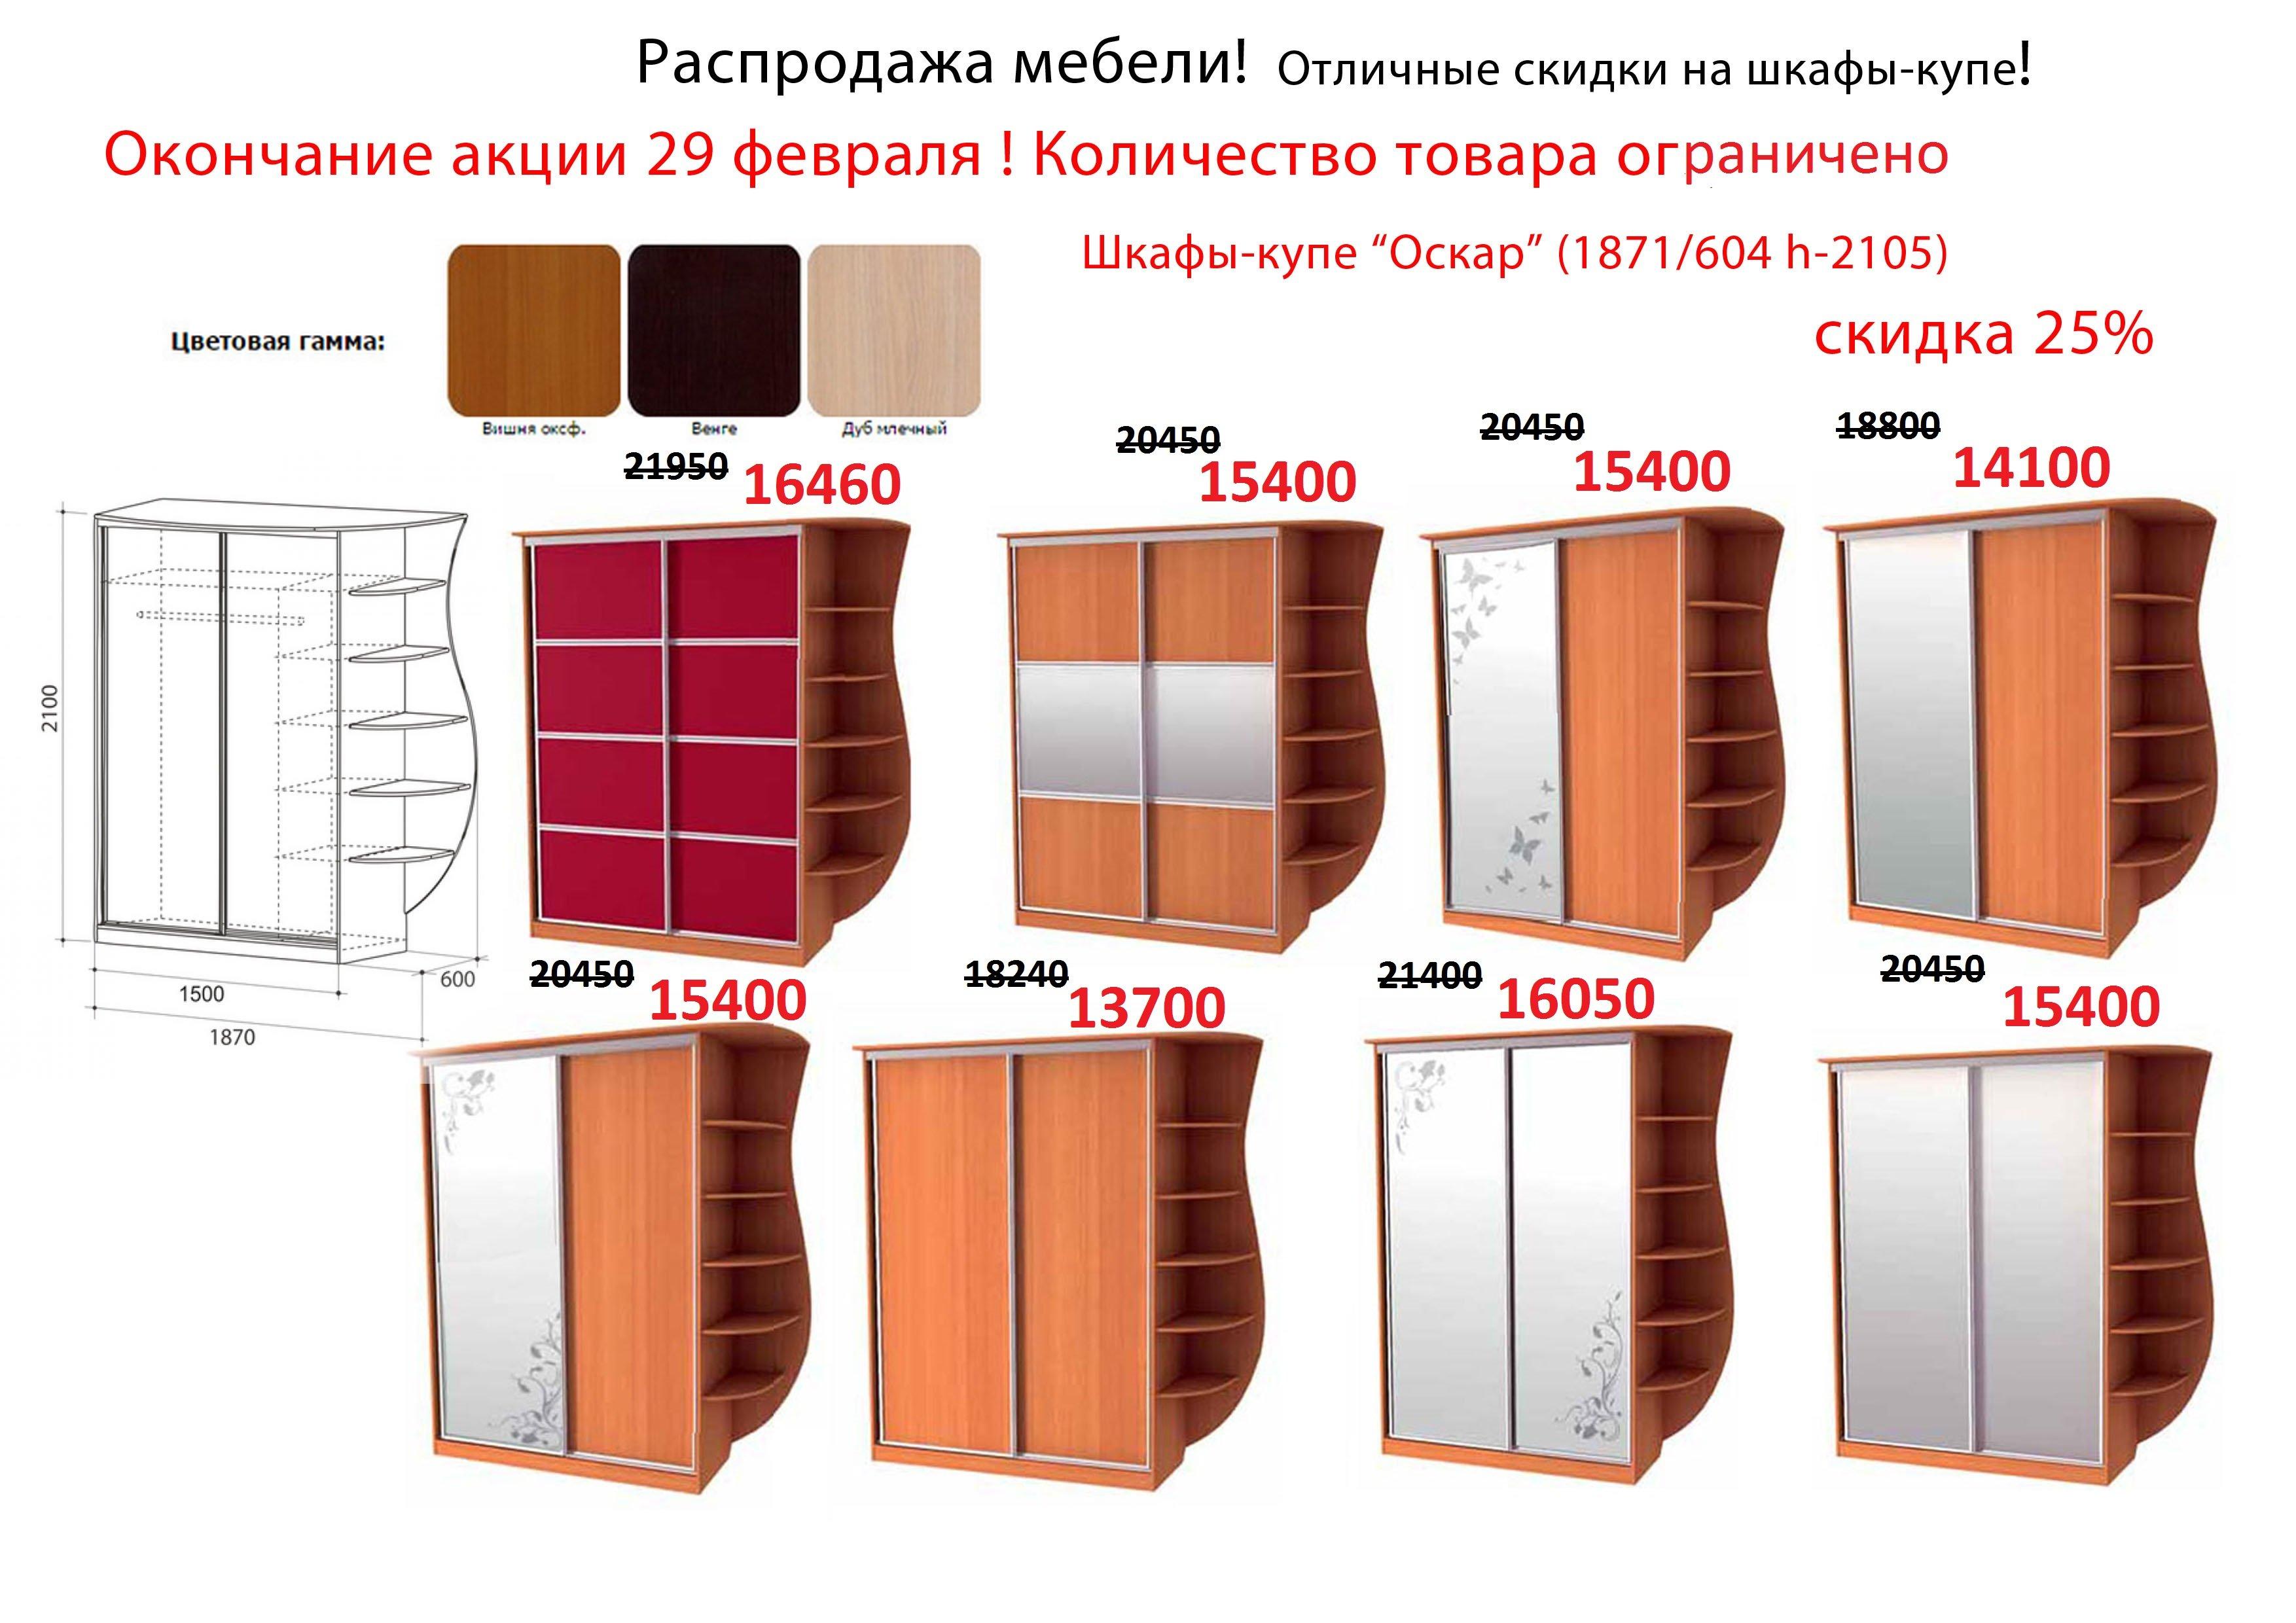 http://online-magazin-mebeli.ru/images/upload/шкафы%20купеоскар.jpg